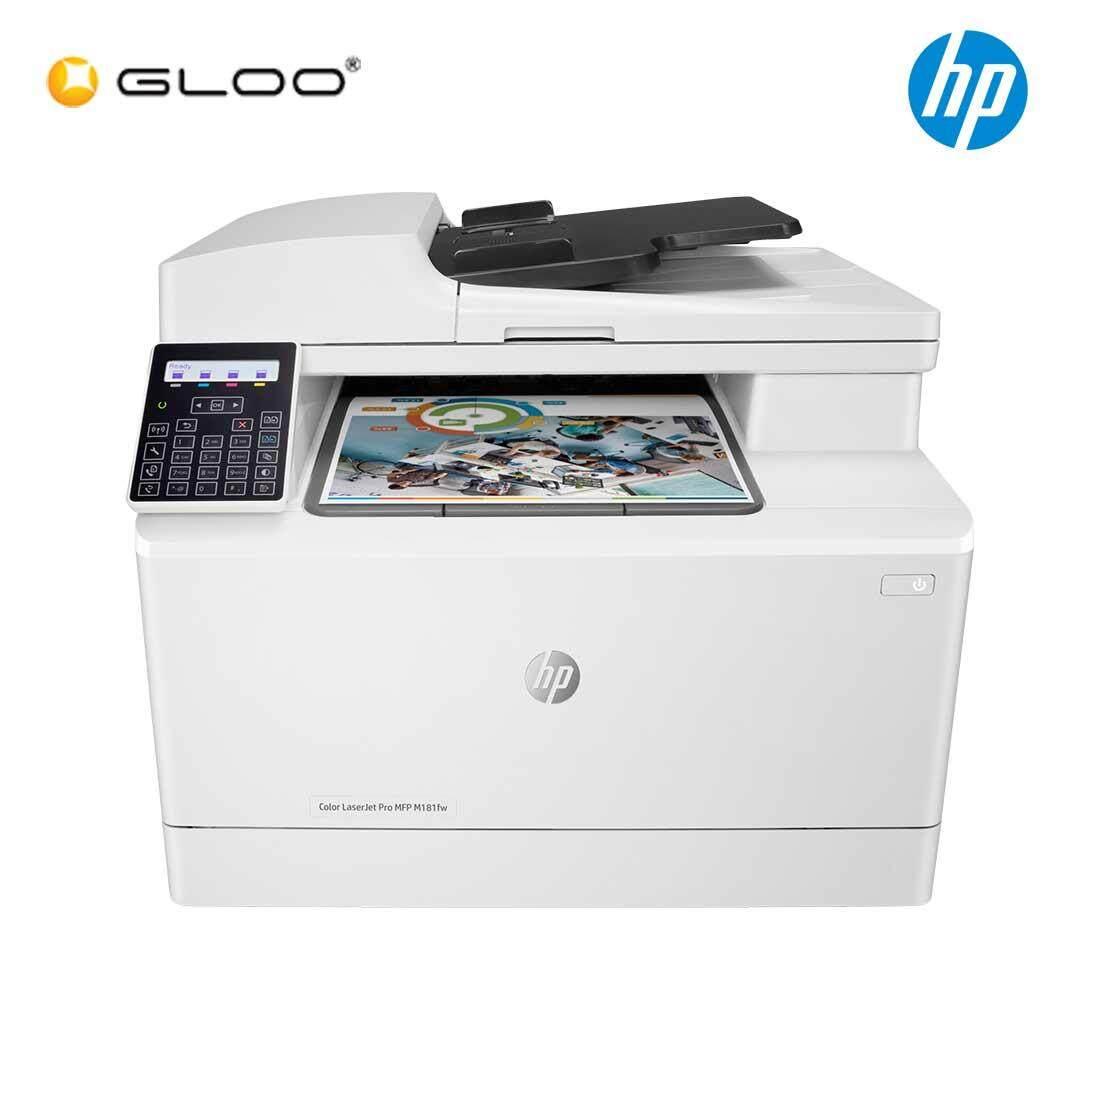 HP Color LaserJet Pro MFP M181fw Laser Printer (T6B71A) - White